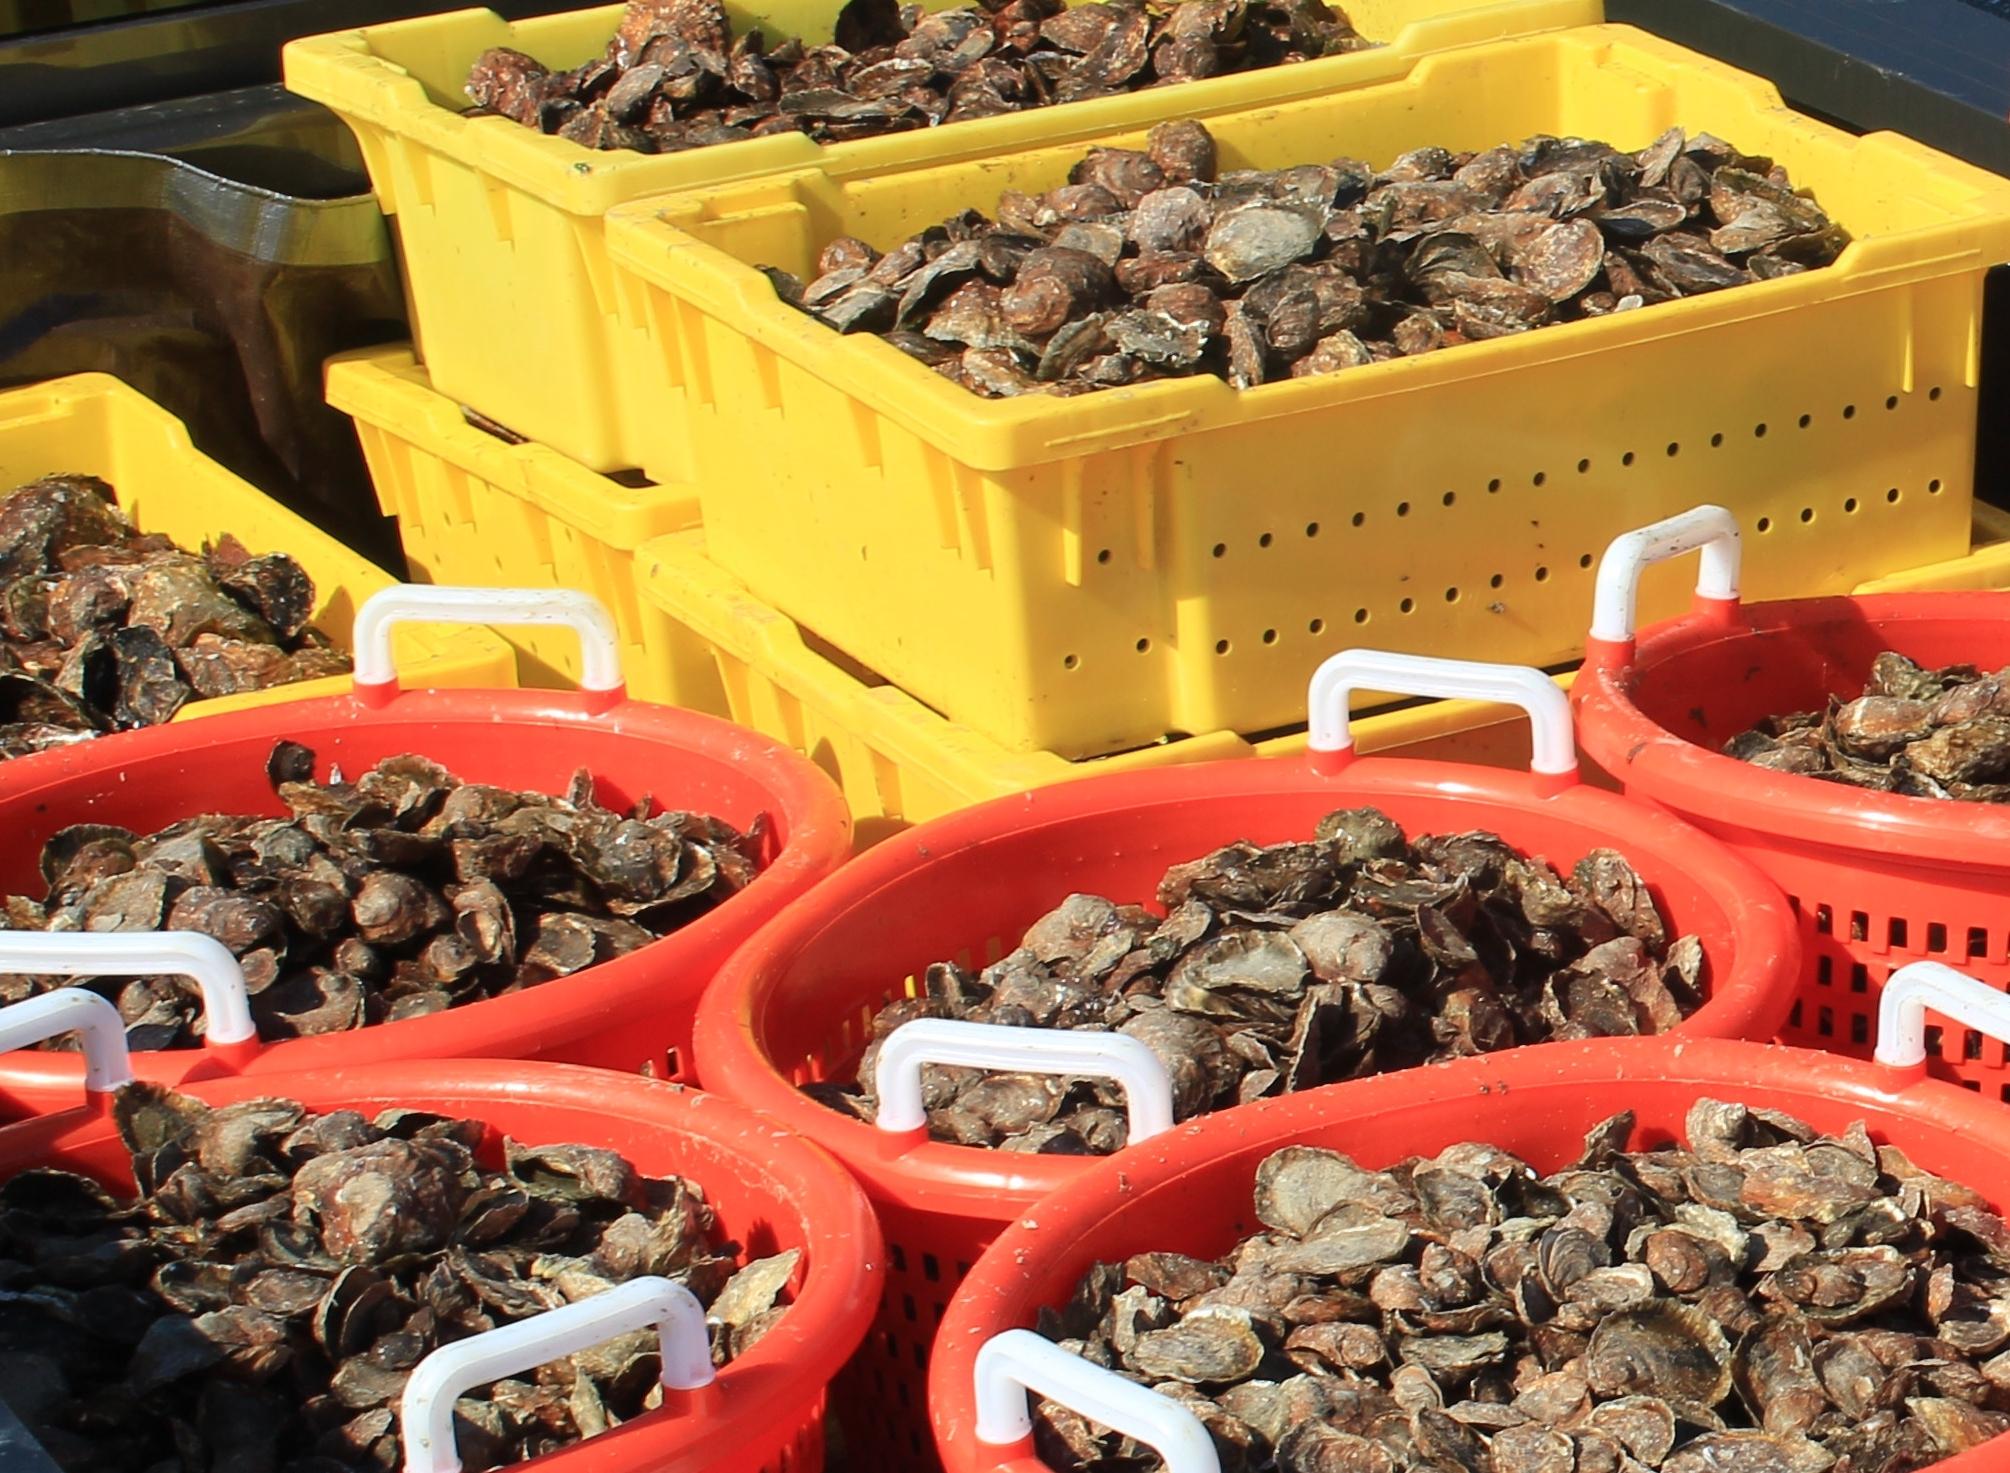 Scnd Plnt oyster bushels.JPG